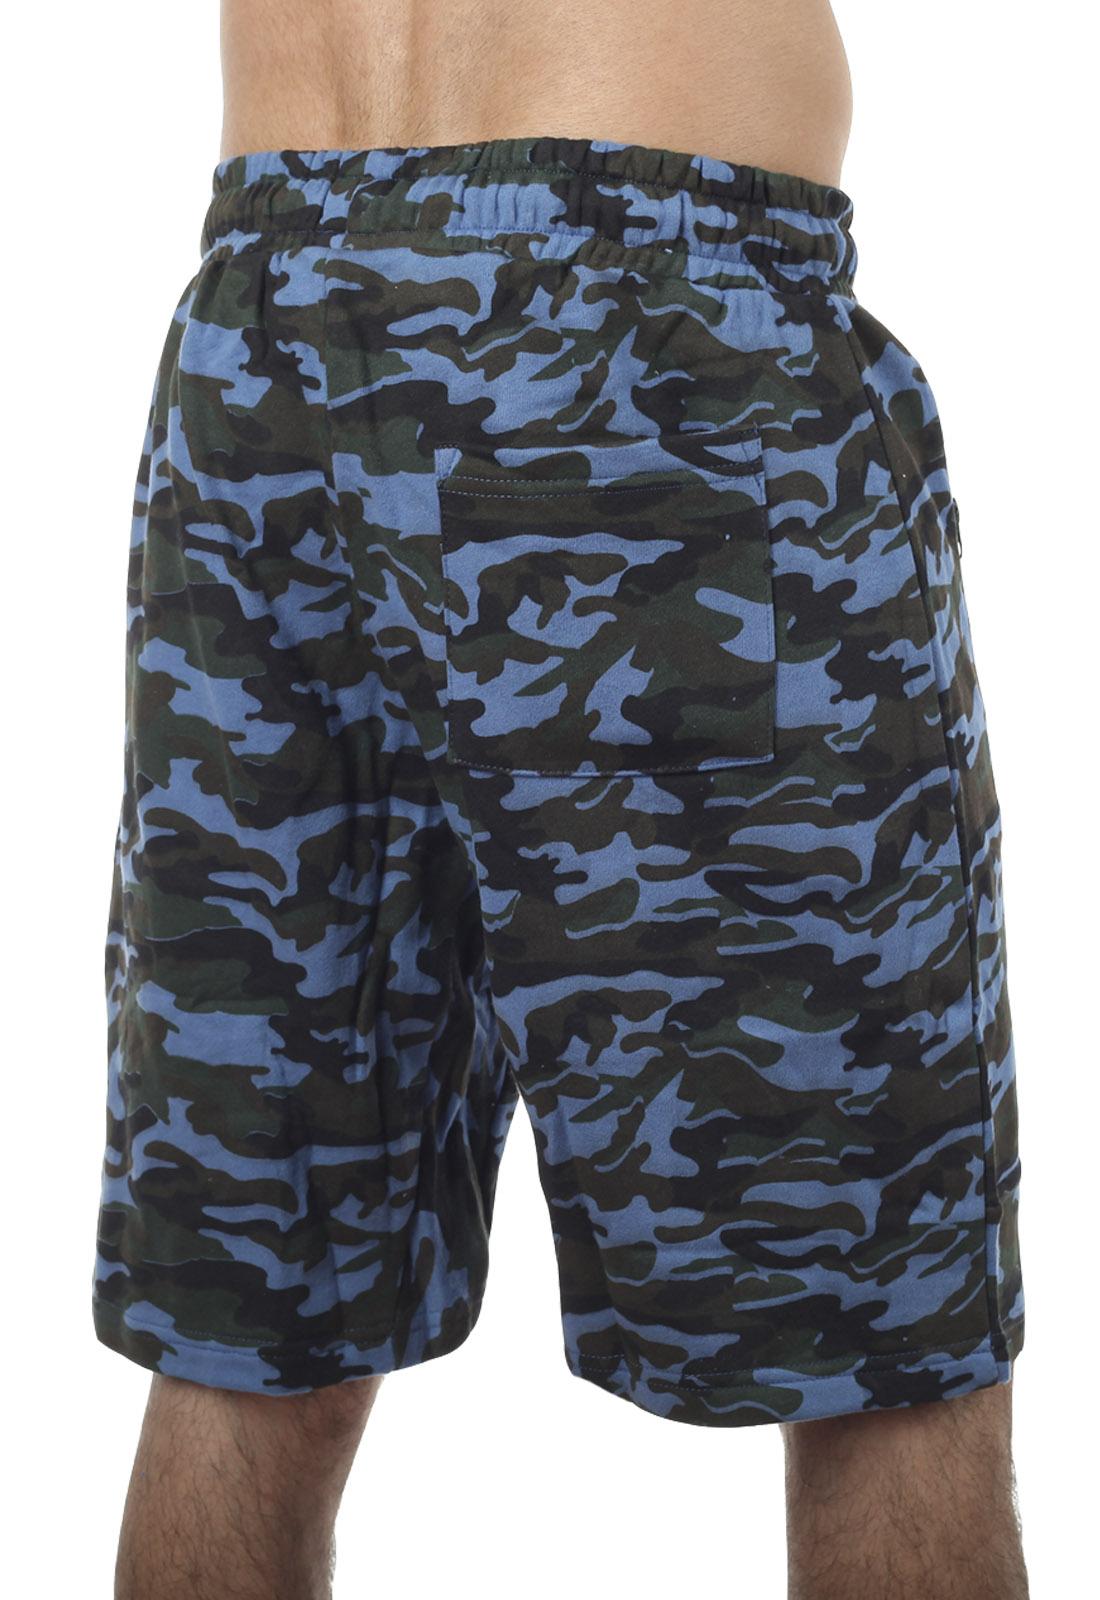 Заказать онлайн одежду спецназовцев ГРУ